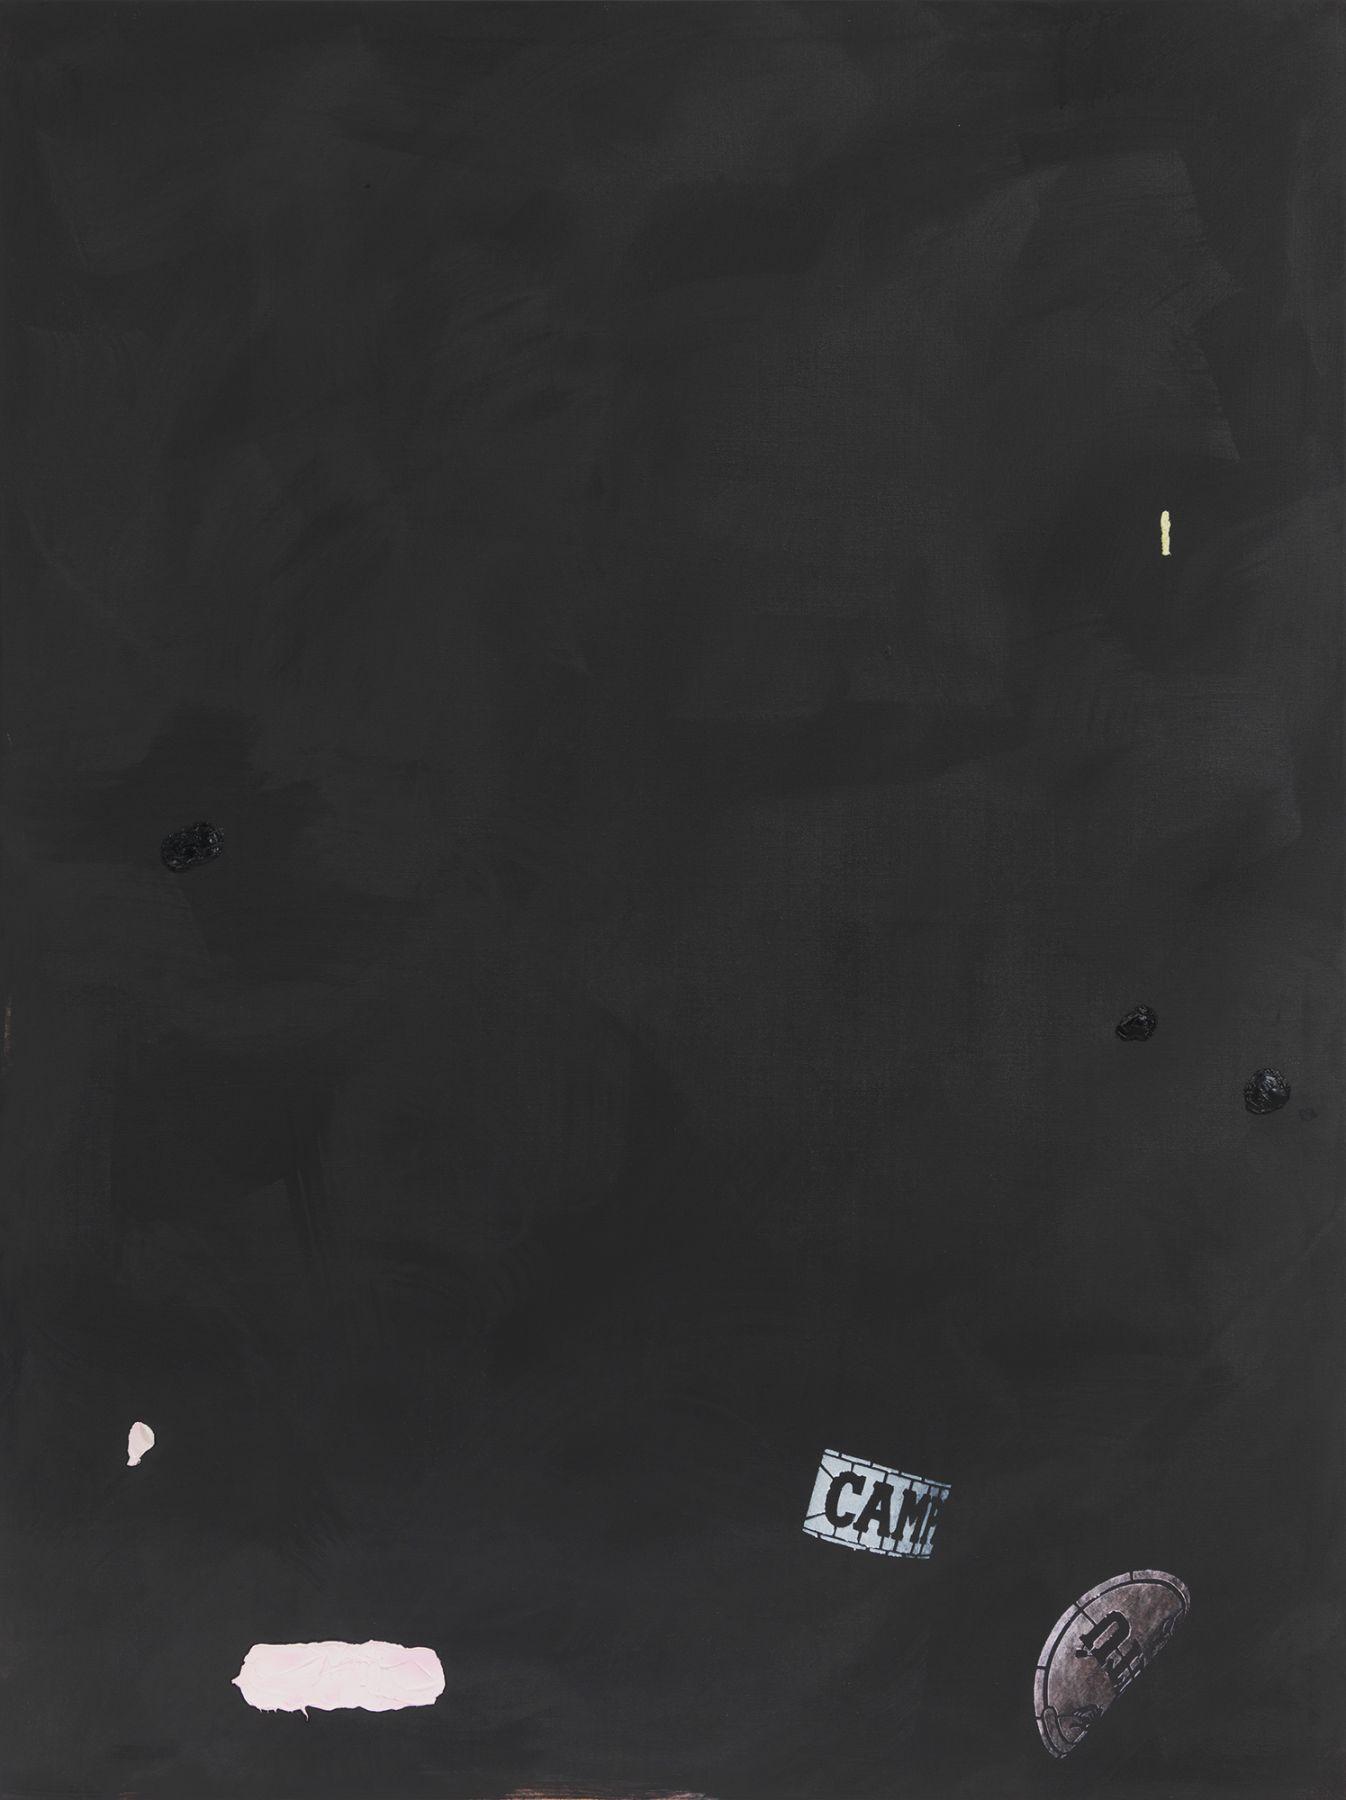 Monika Baer on hold (pink pitú), 2015 Acrylic, oil on canvas 70 3/4 x 53 1/4 inches (180 x 135 cm)